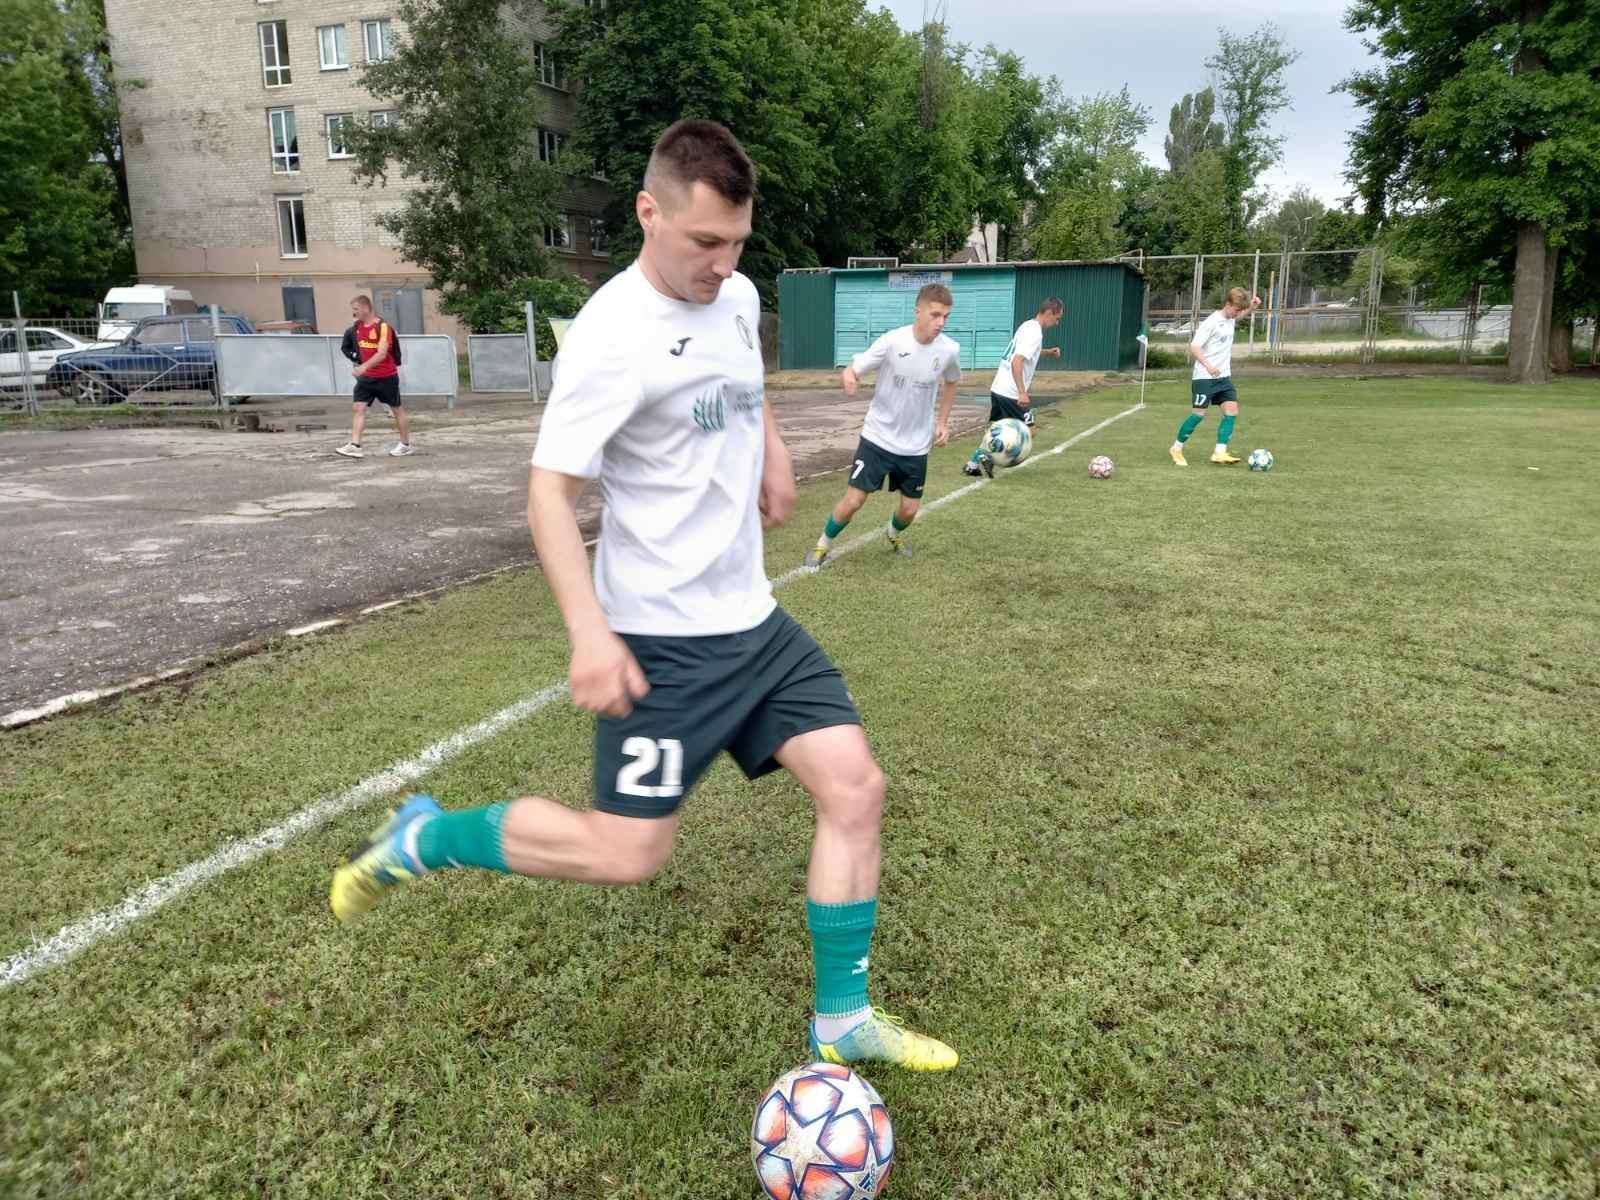 ФК Квадро vs ФК Богодухов - 6 ТУР - Чемпионат Харьковской области по футболу 2021